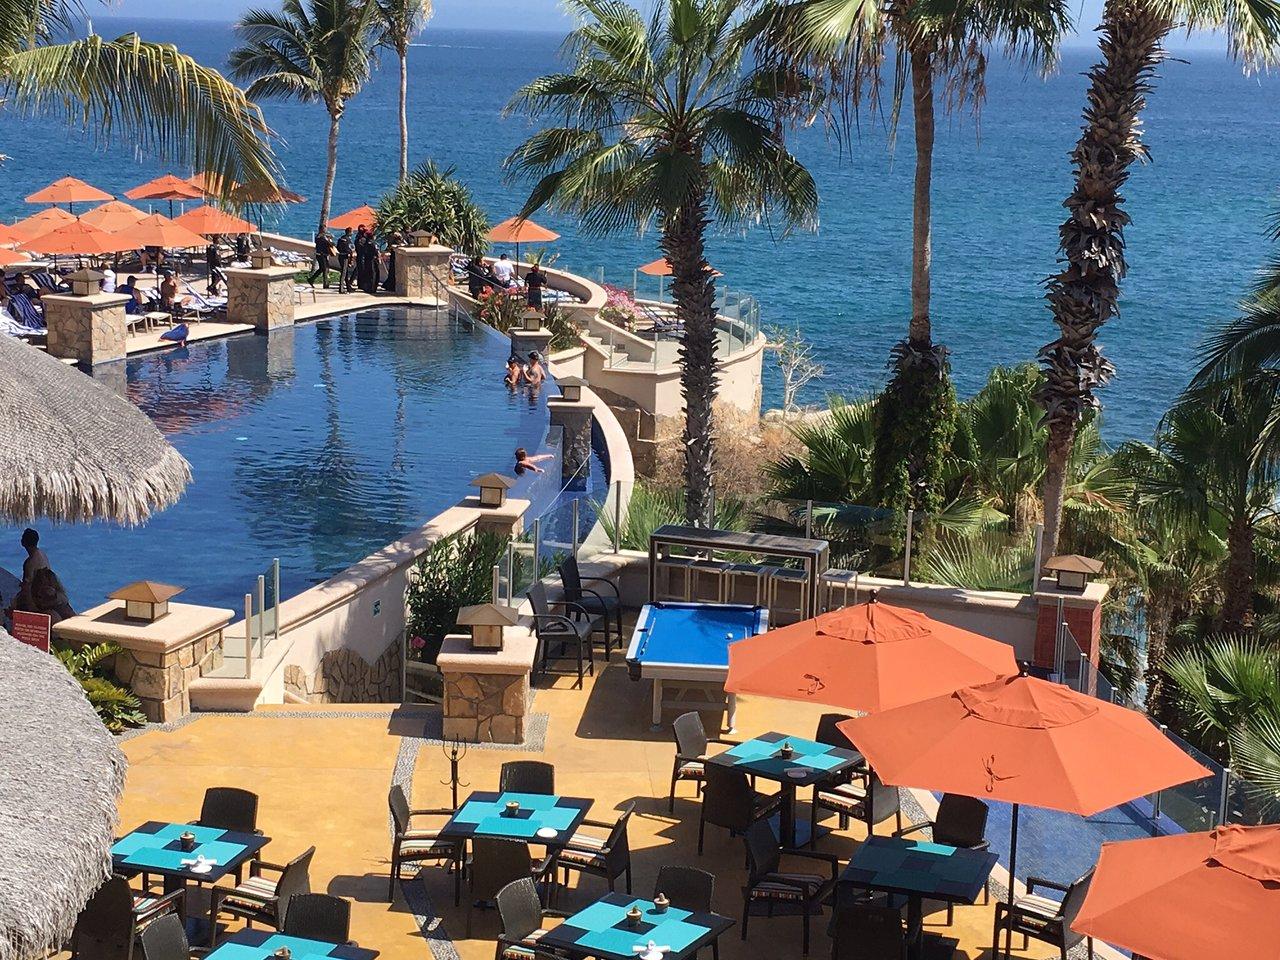 Welk_Resorts_Cabo_San_Lucas_Sirena_del_Mar_Pool_Seating_7ffb6ff636.jpg